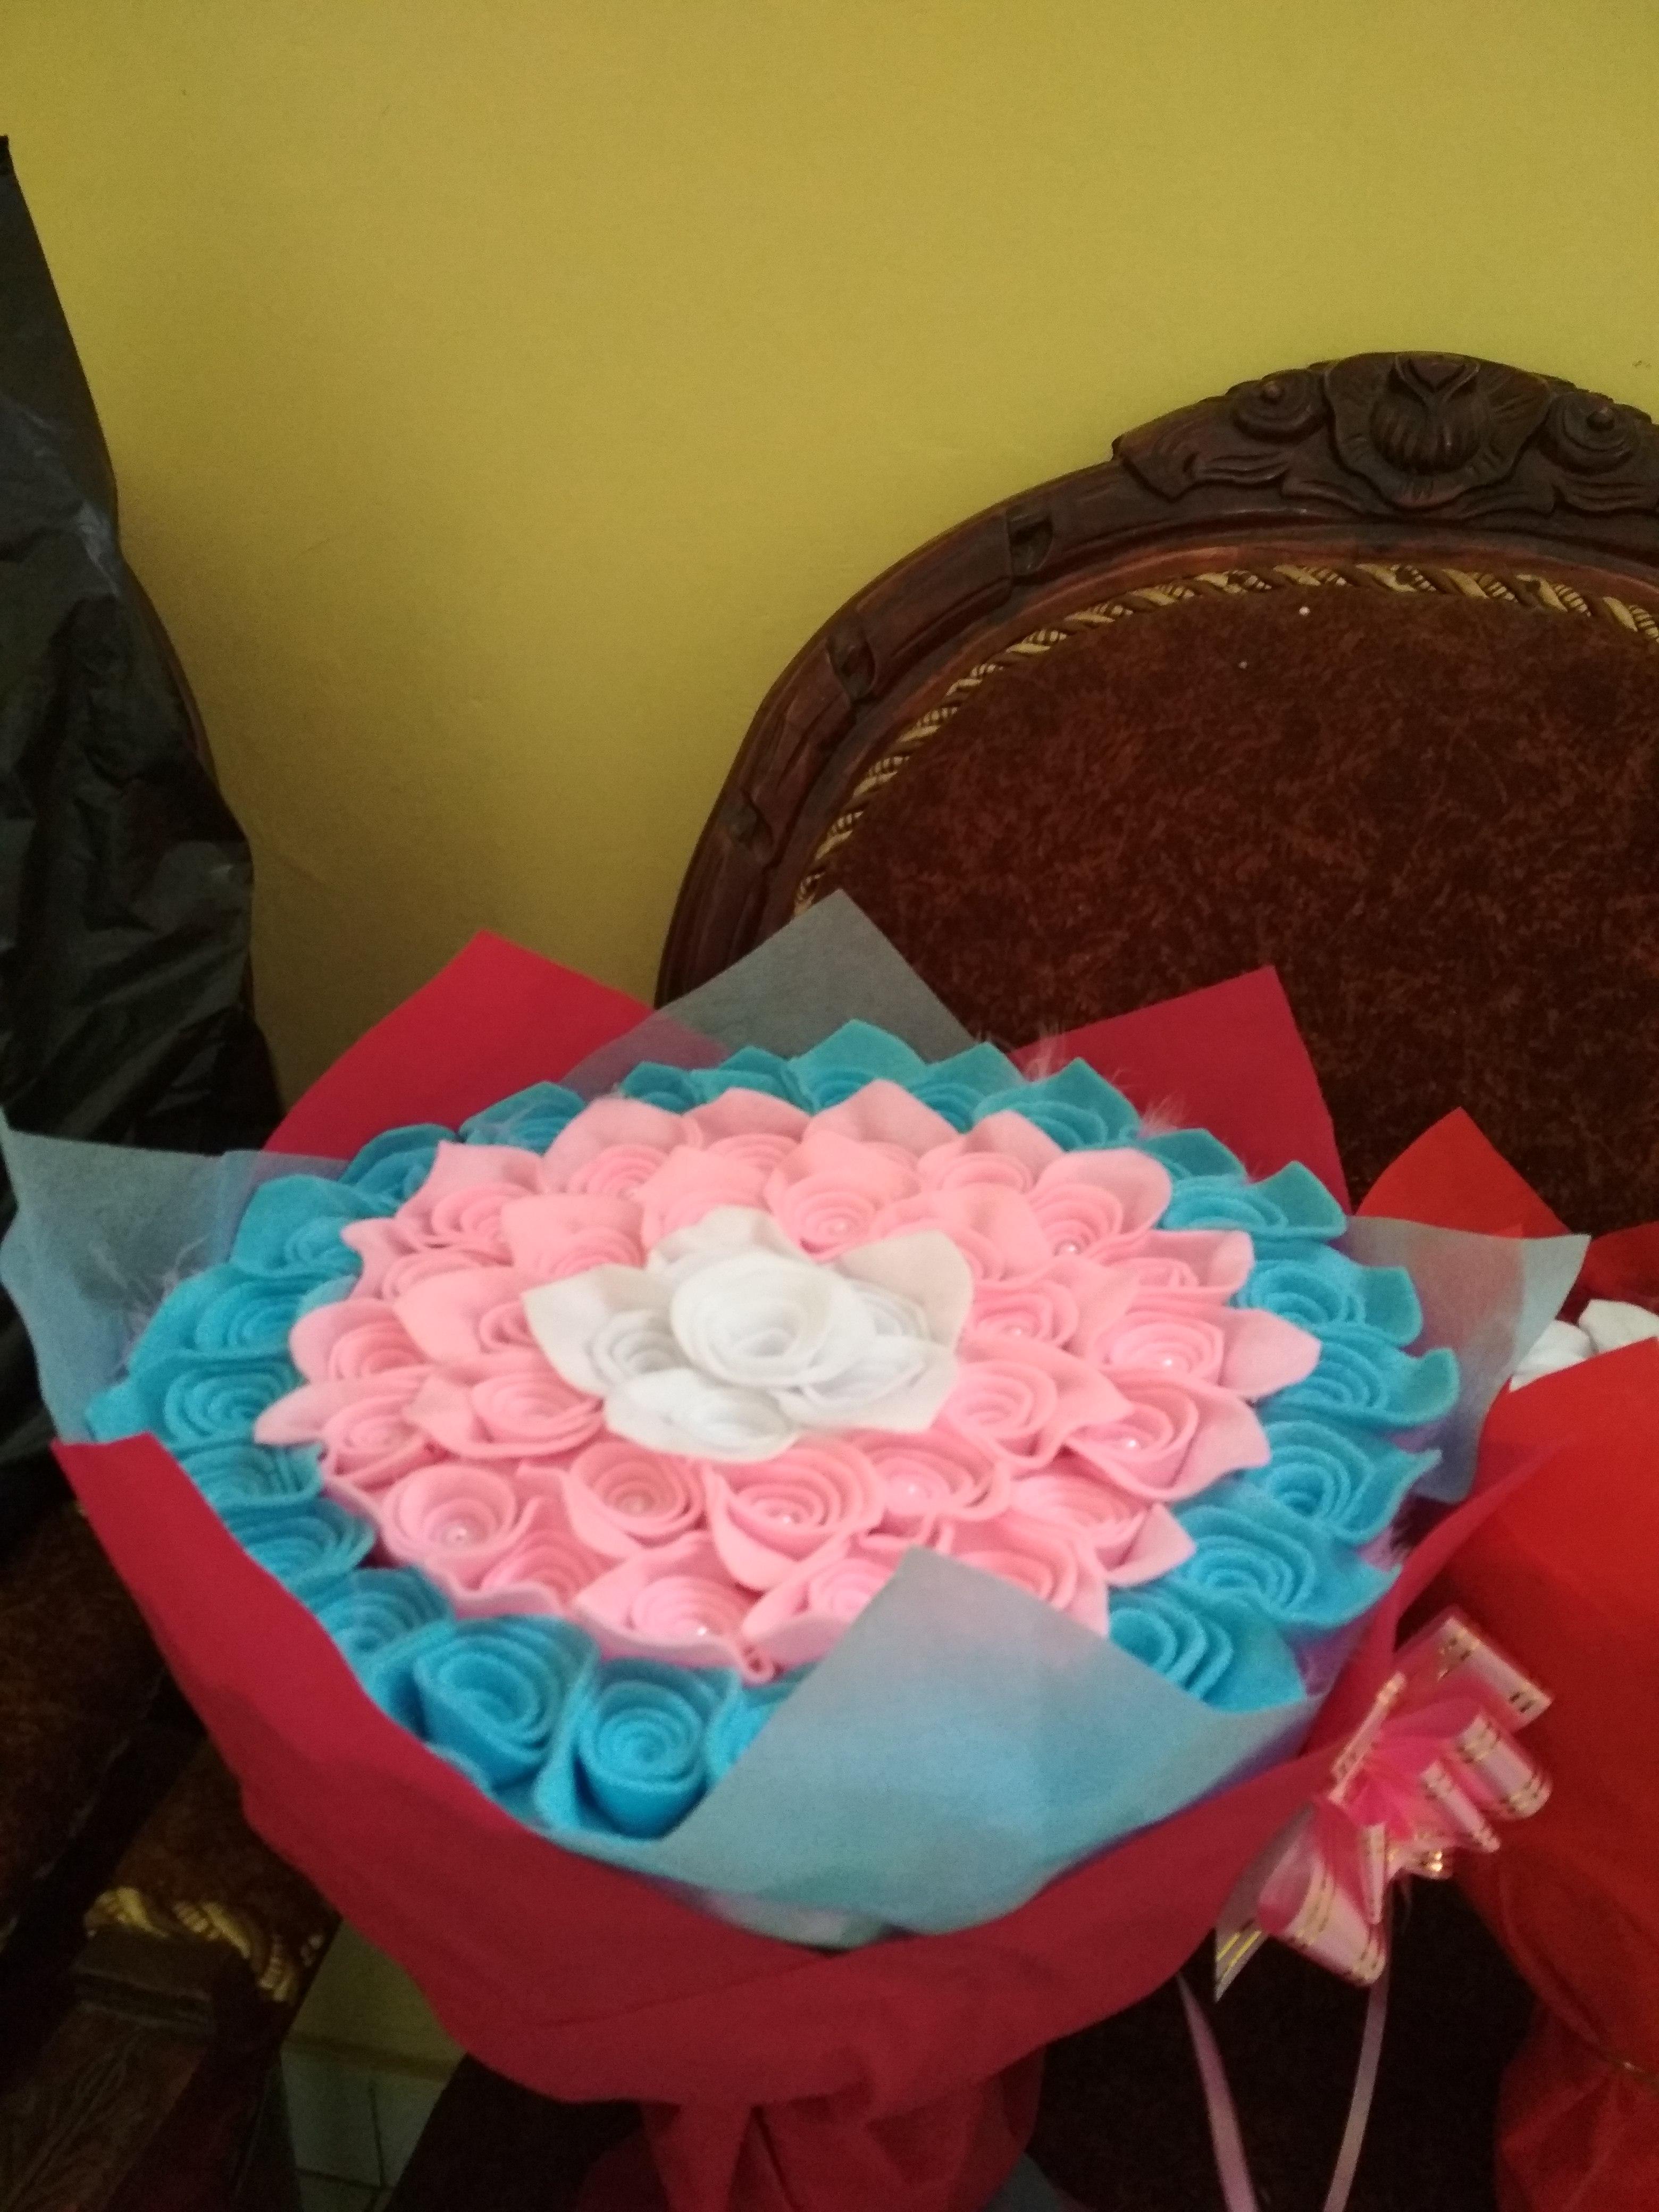 Alamat Ecer Buket Bunga Flanel Biru Muda Wisuda Bagus di Barabai